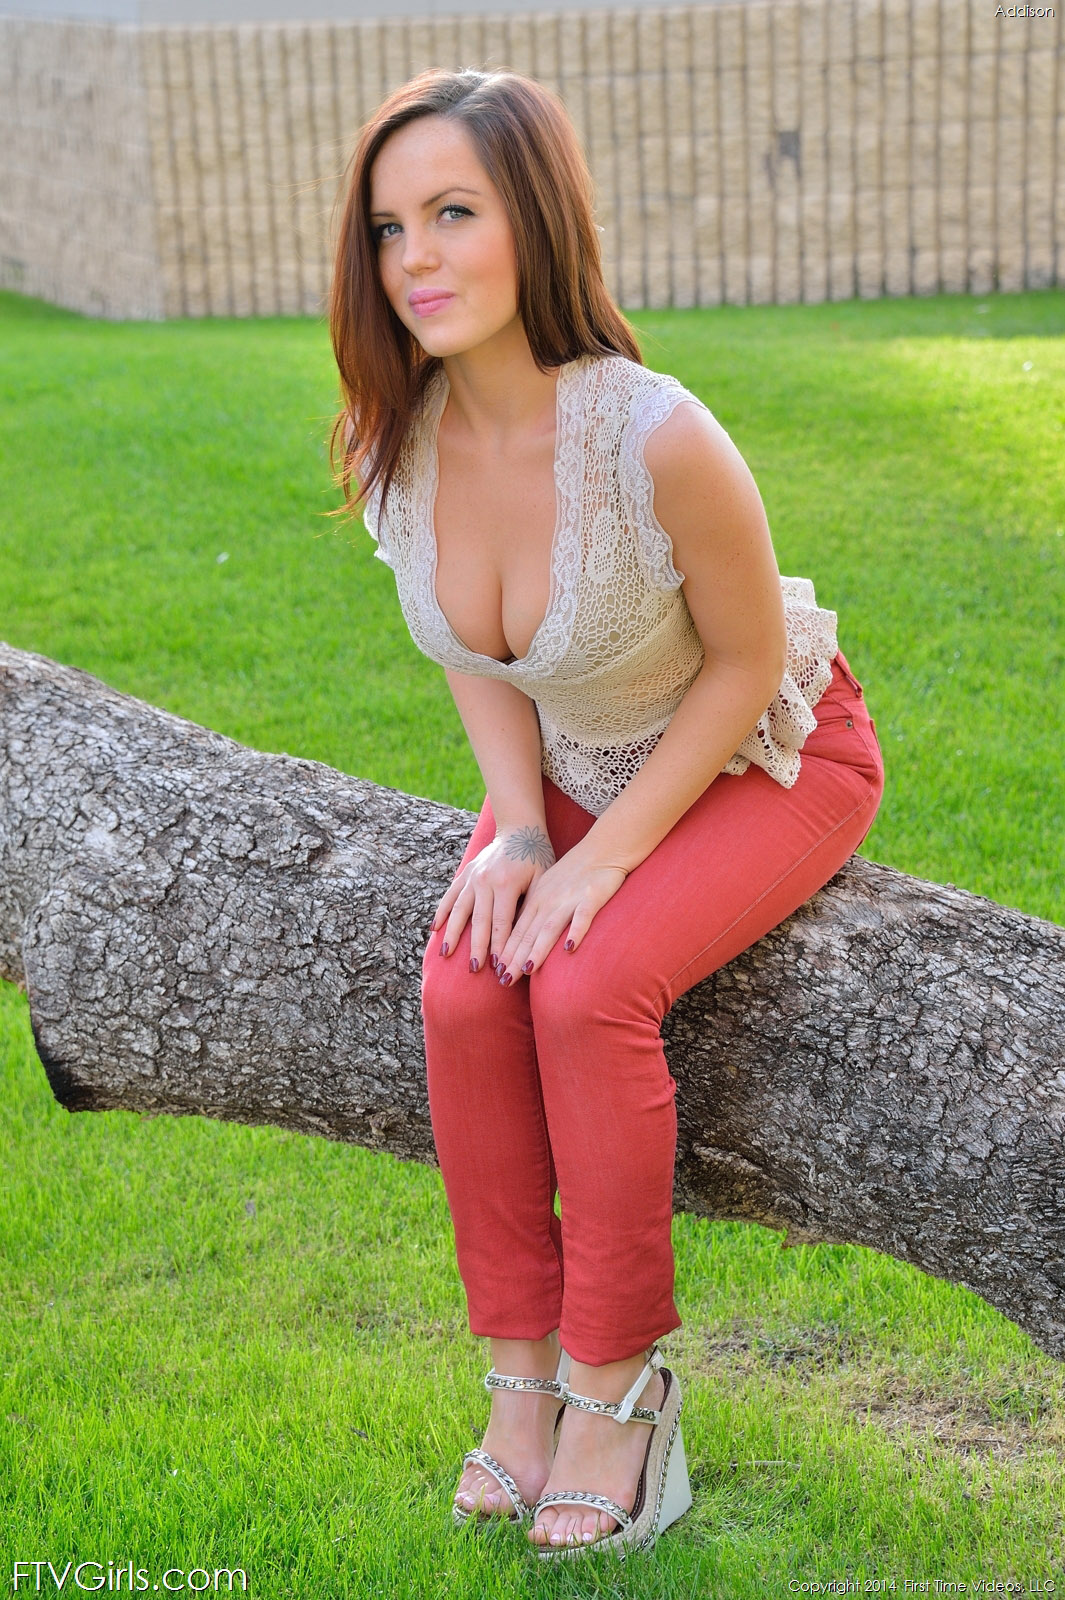 Natural beautiful addison gorgeous tits new ftvgirls apologise, but, opinion